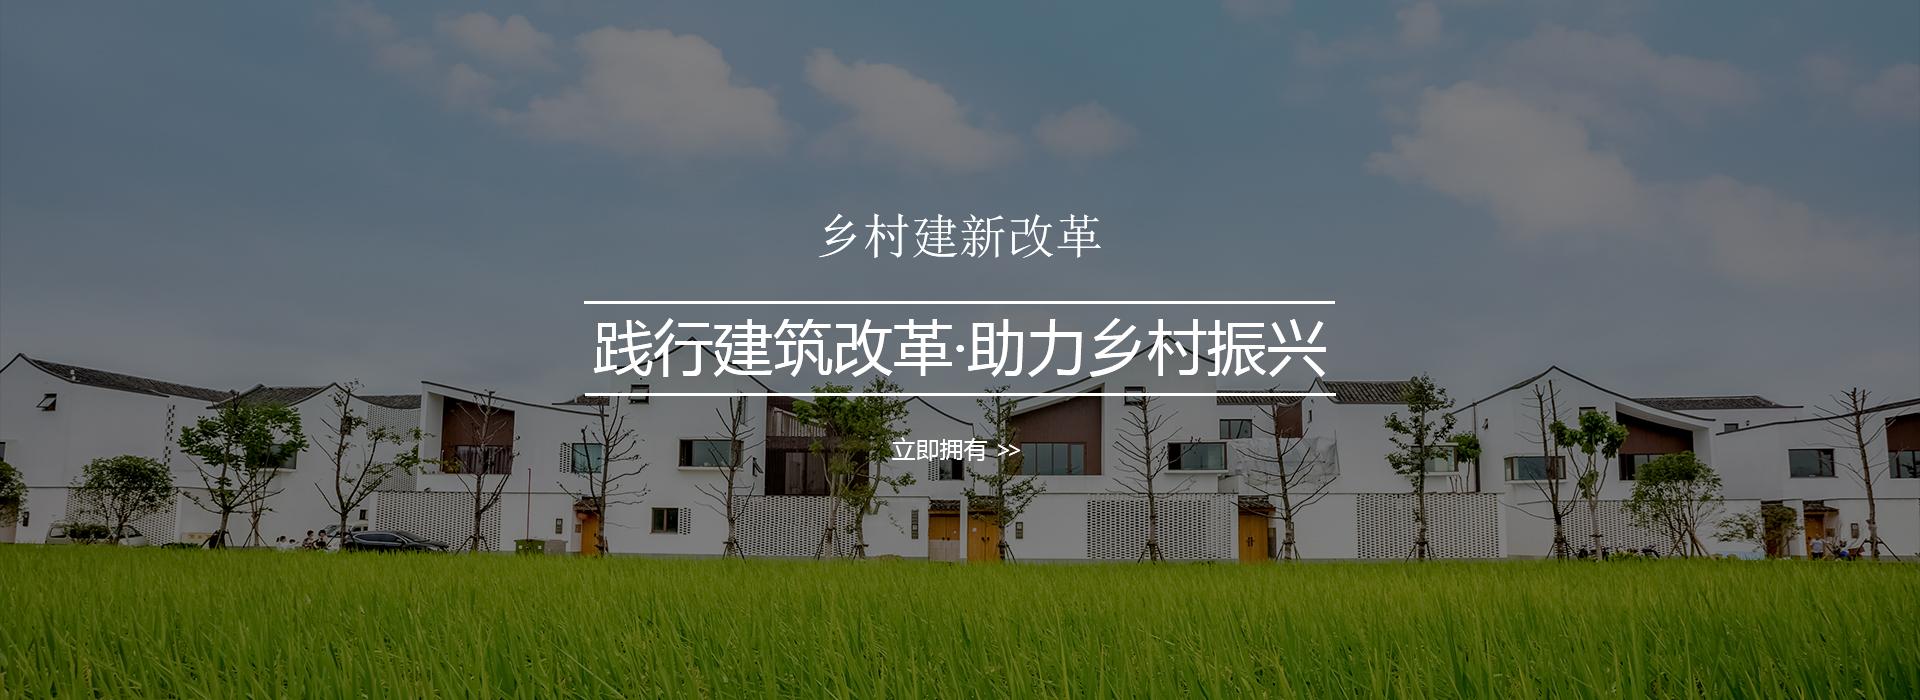 https://www.jiandonganjia.com/data/upload/202012/20201201091039_570.jpg